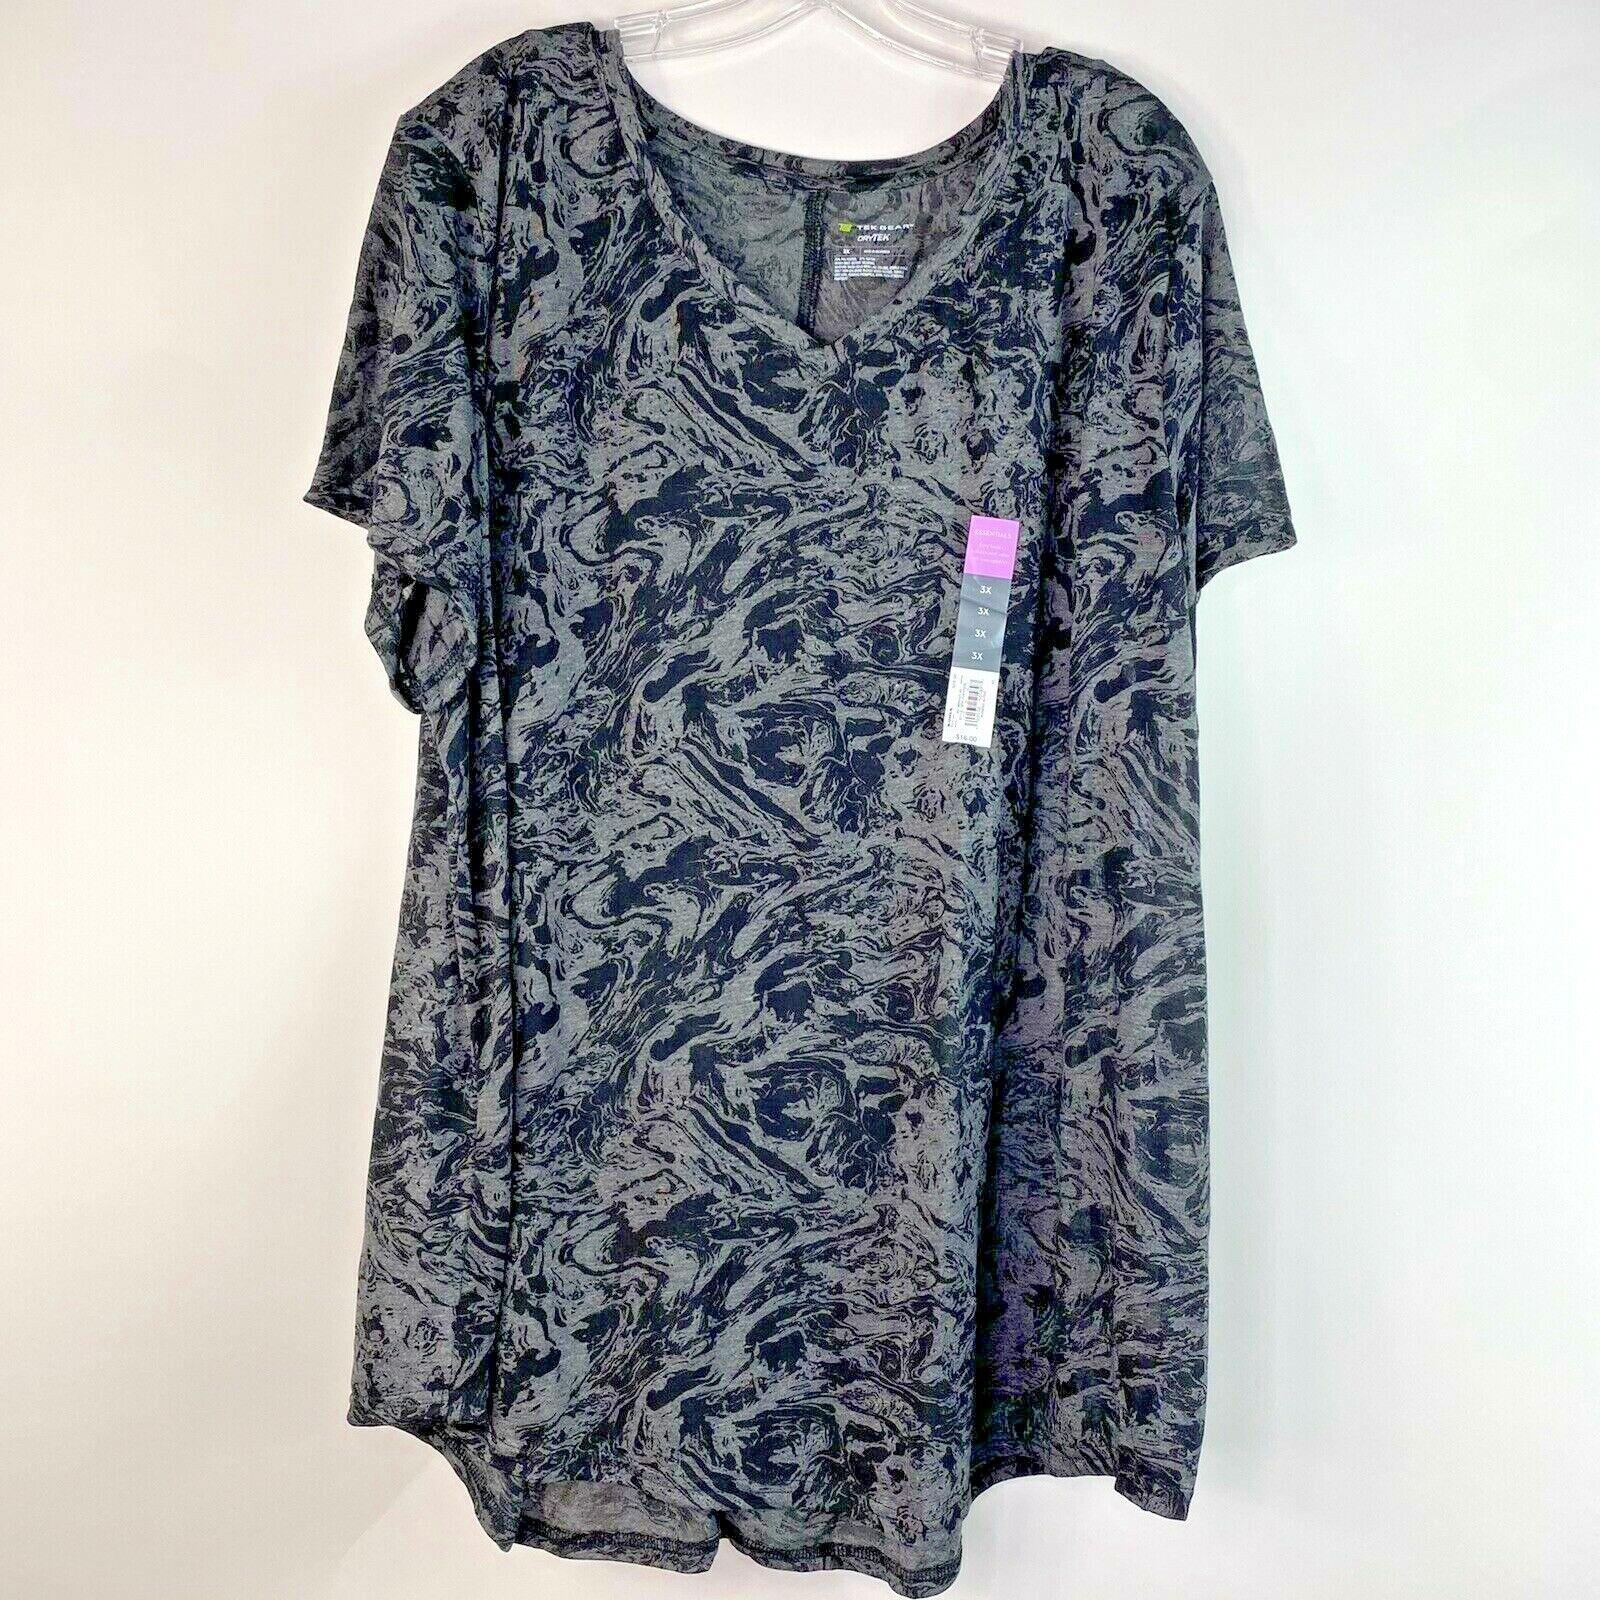 TEK GEAR drytek V Neck T Shirt Womens Size 3X Black short sleeve top New